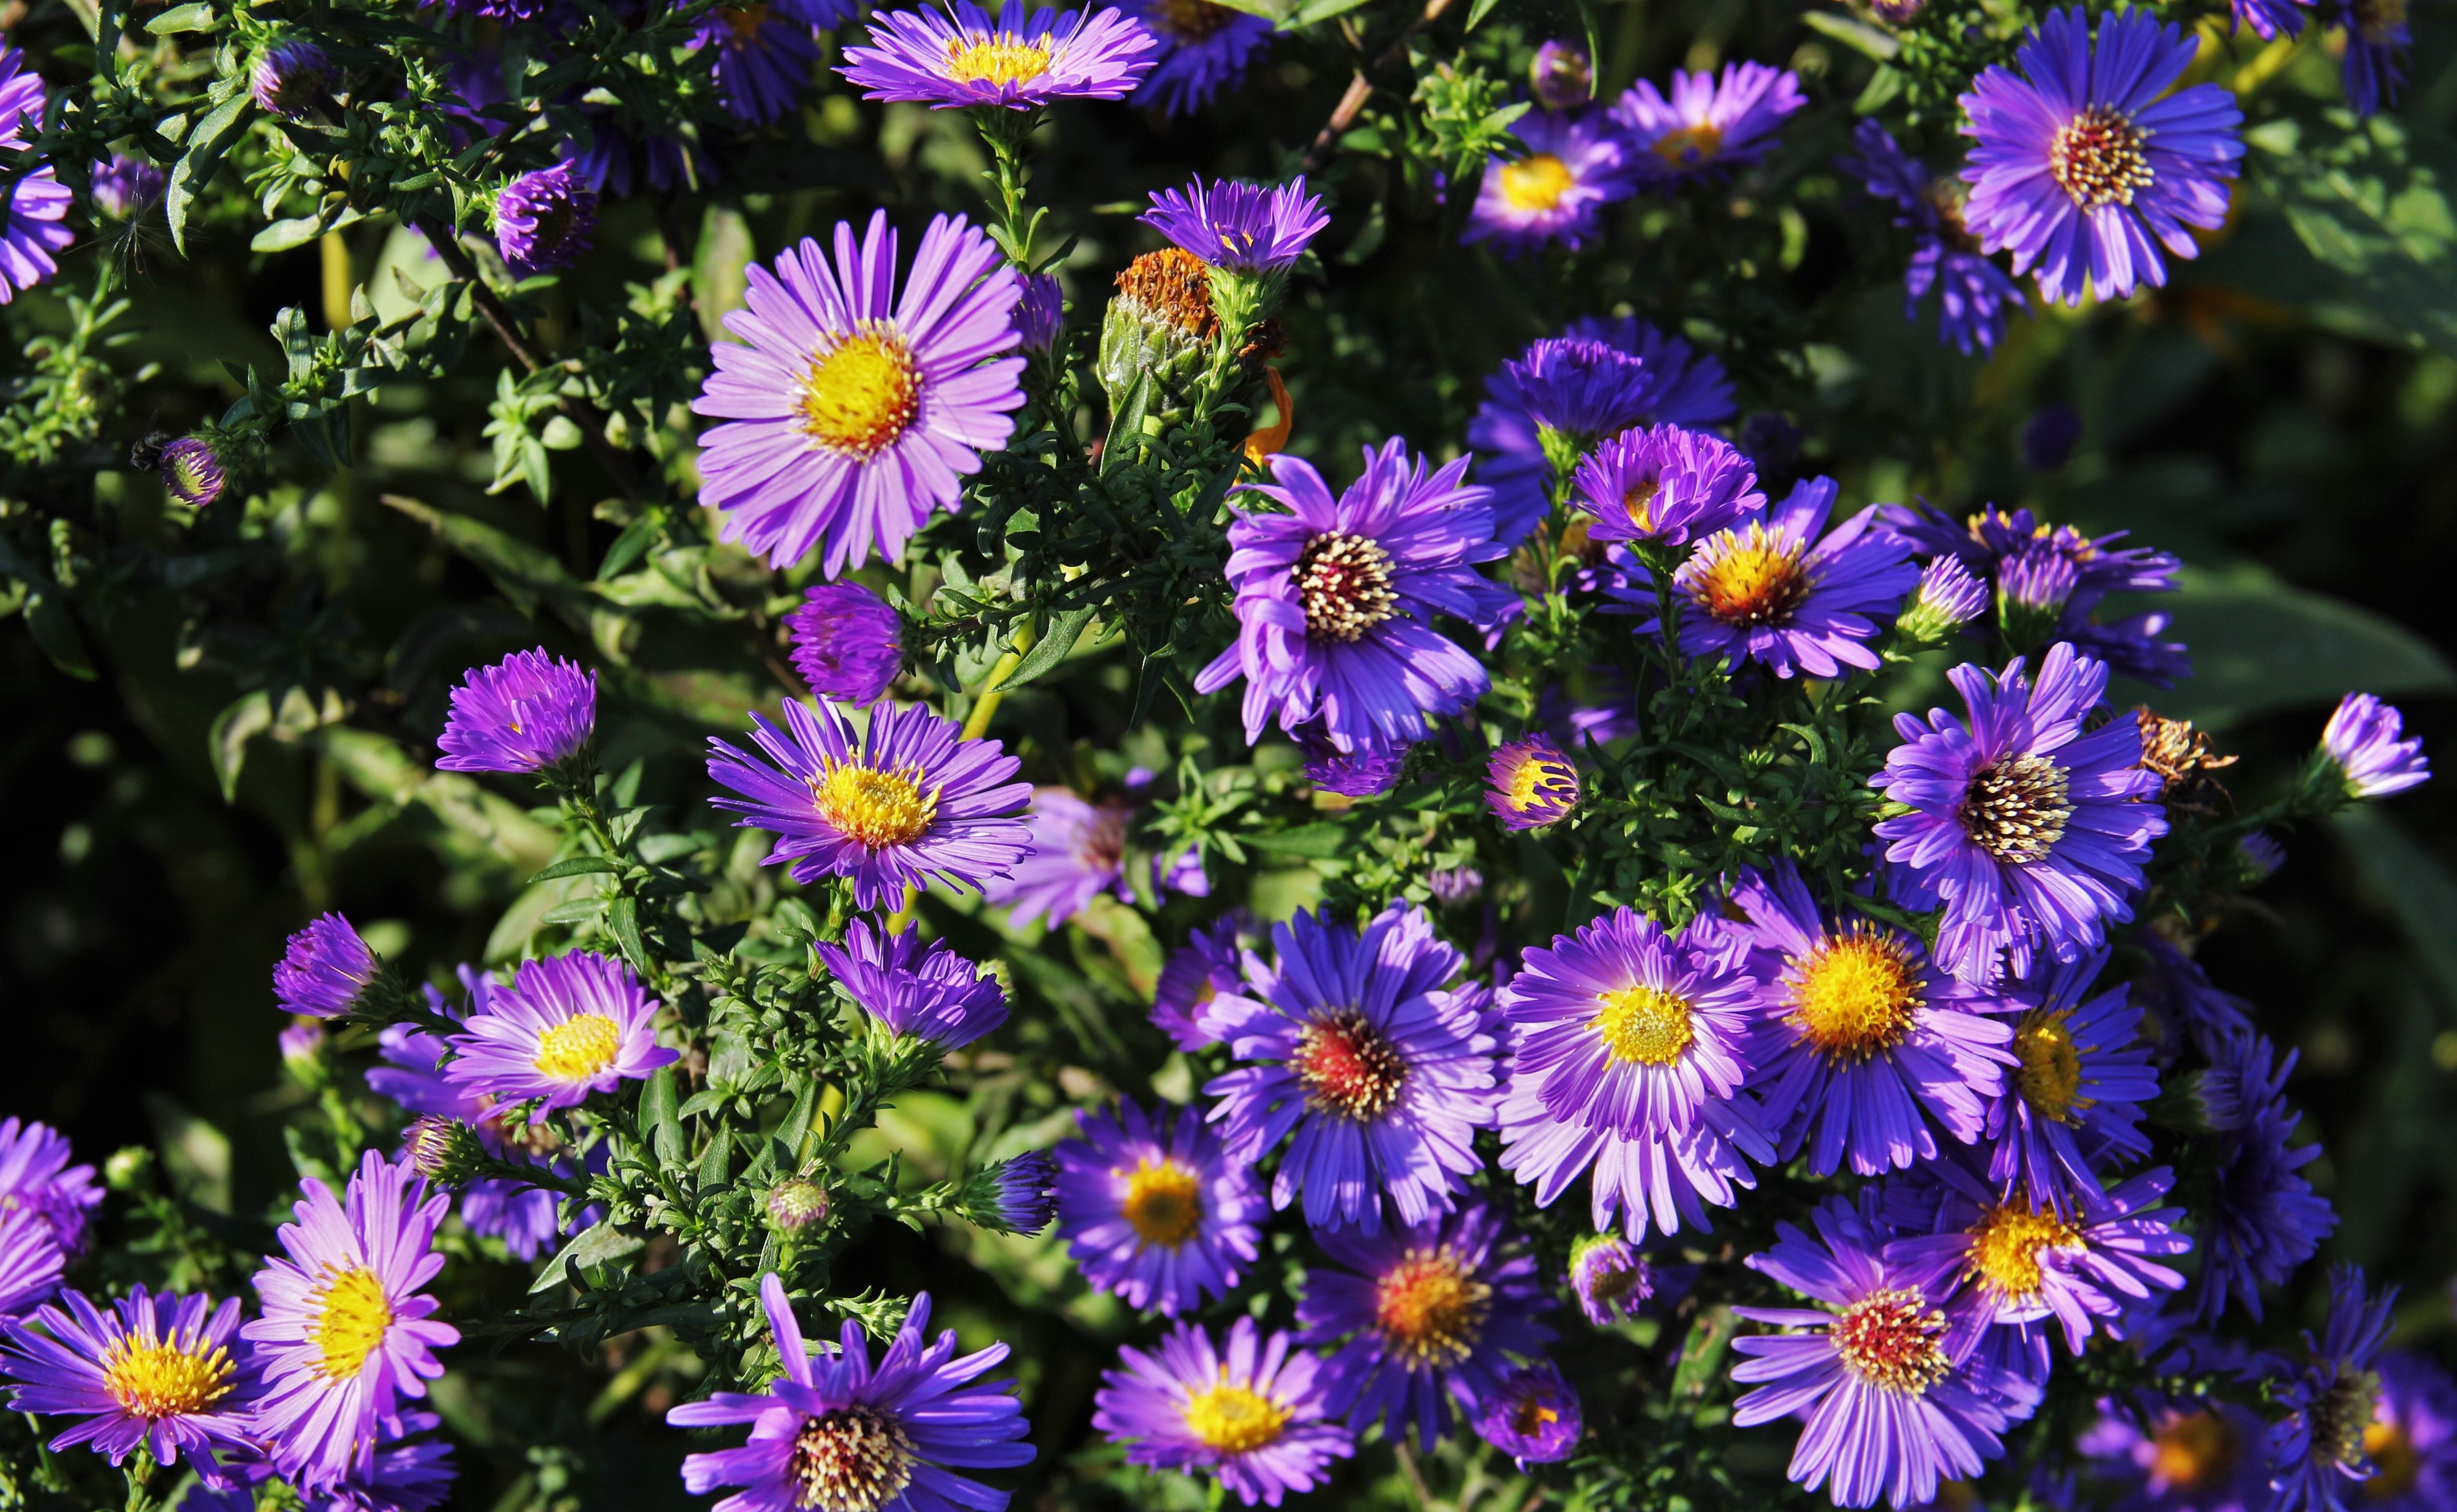 Kostenlose foto : Natur, Wiese, Blume, Botanik, blau, Flora ...